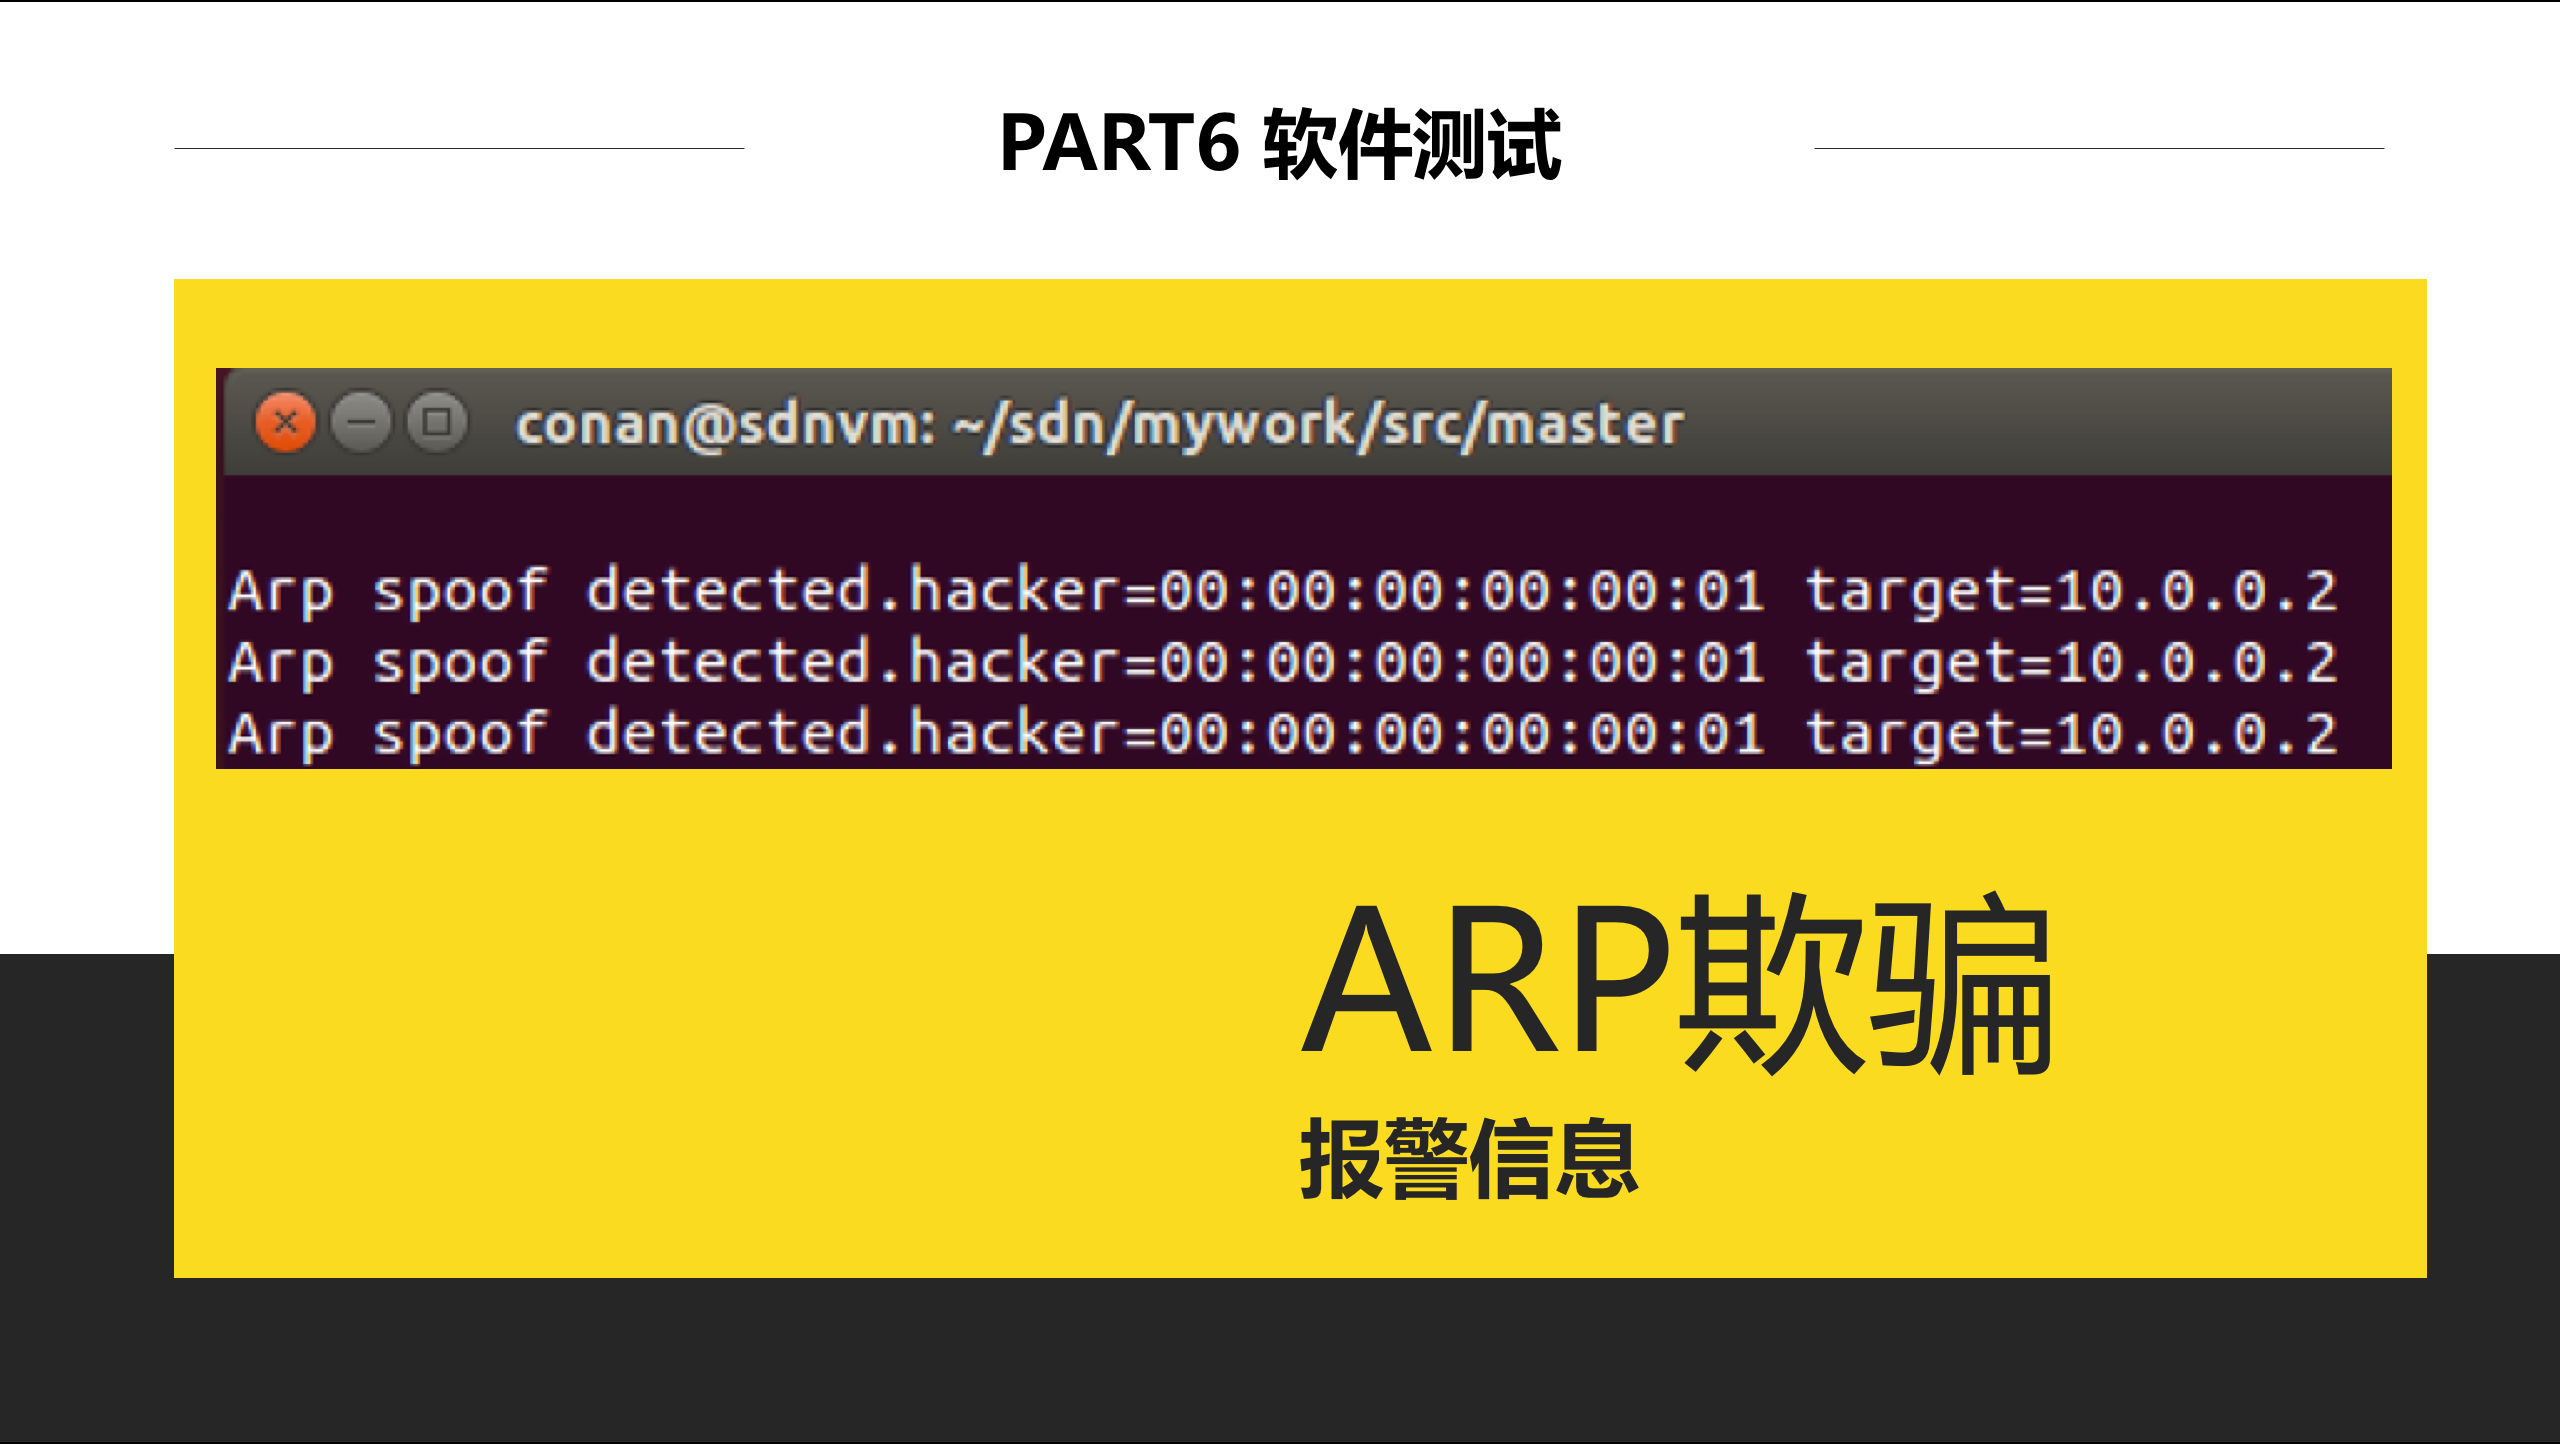 ARP欺骗检测